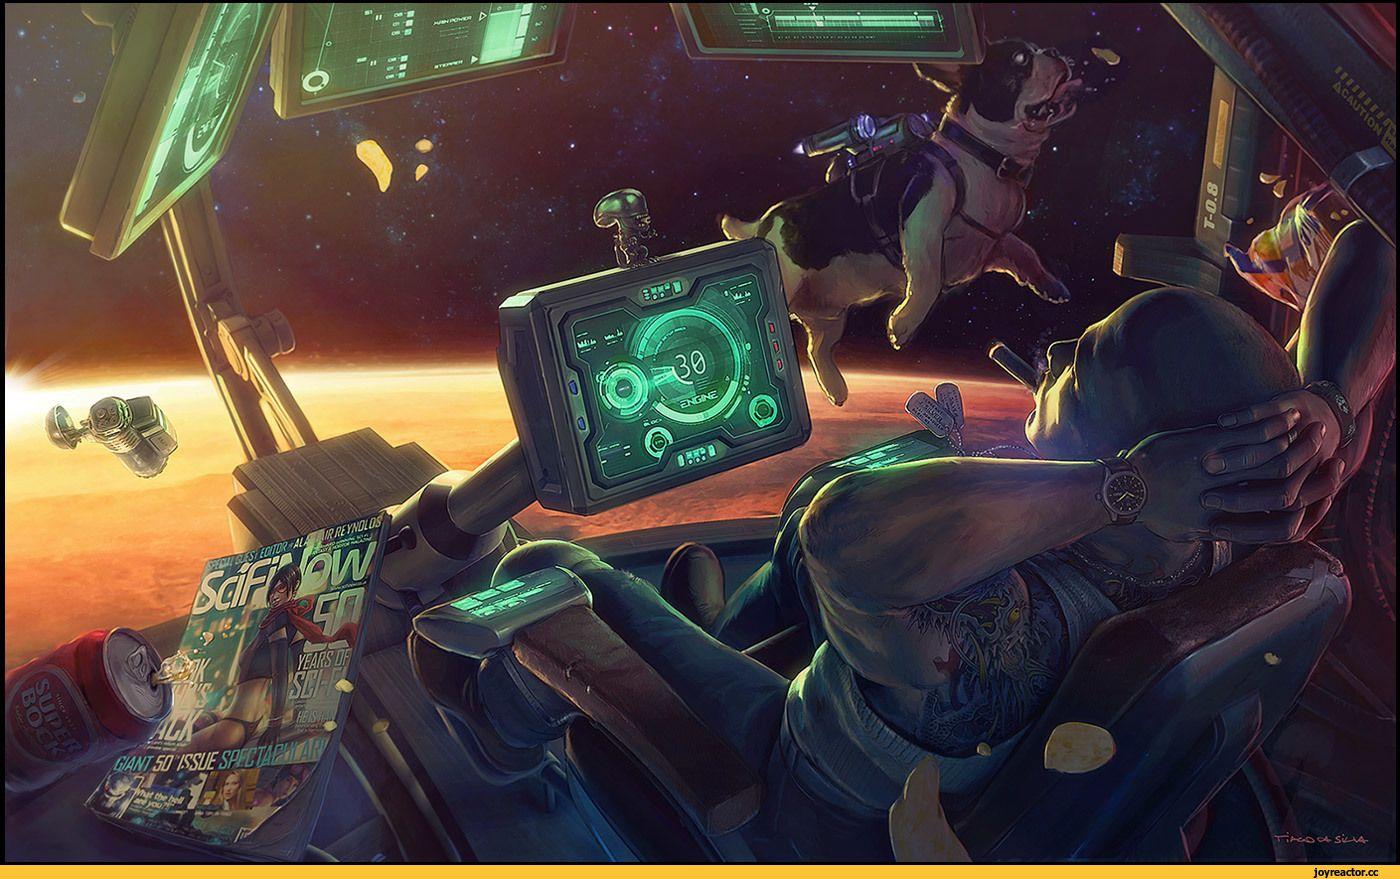 http//img220.joyreactor.cc/pics/post/full/grafik Sci Fi art D220BA ...